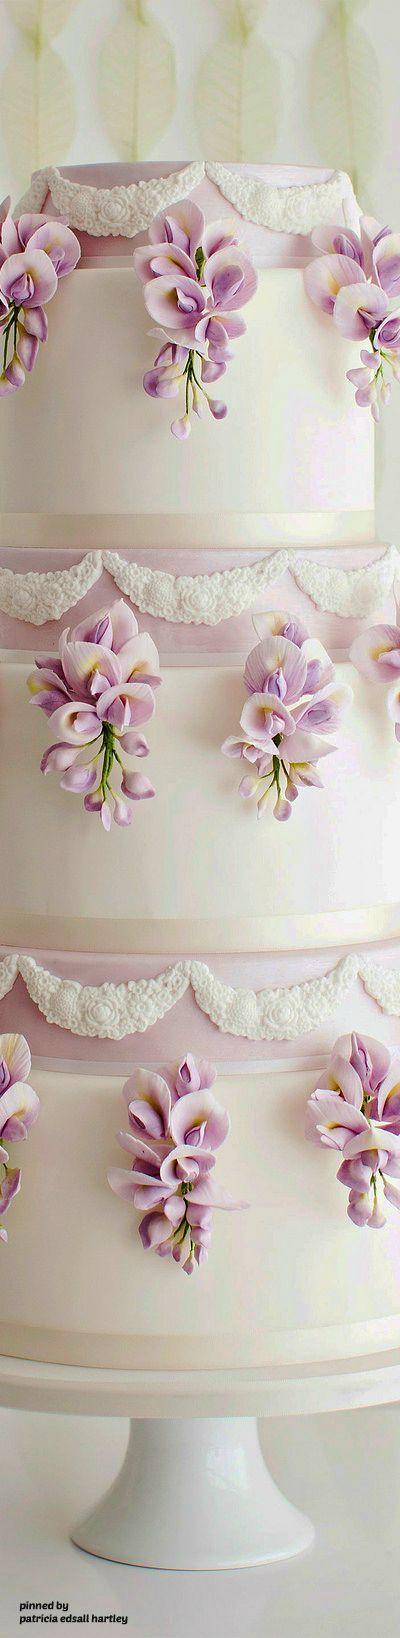 Wiateria cake- lovely!